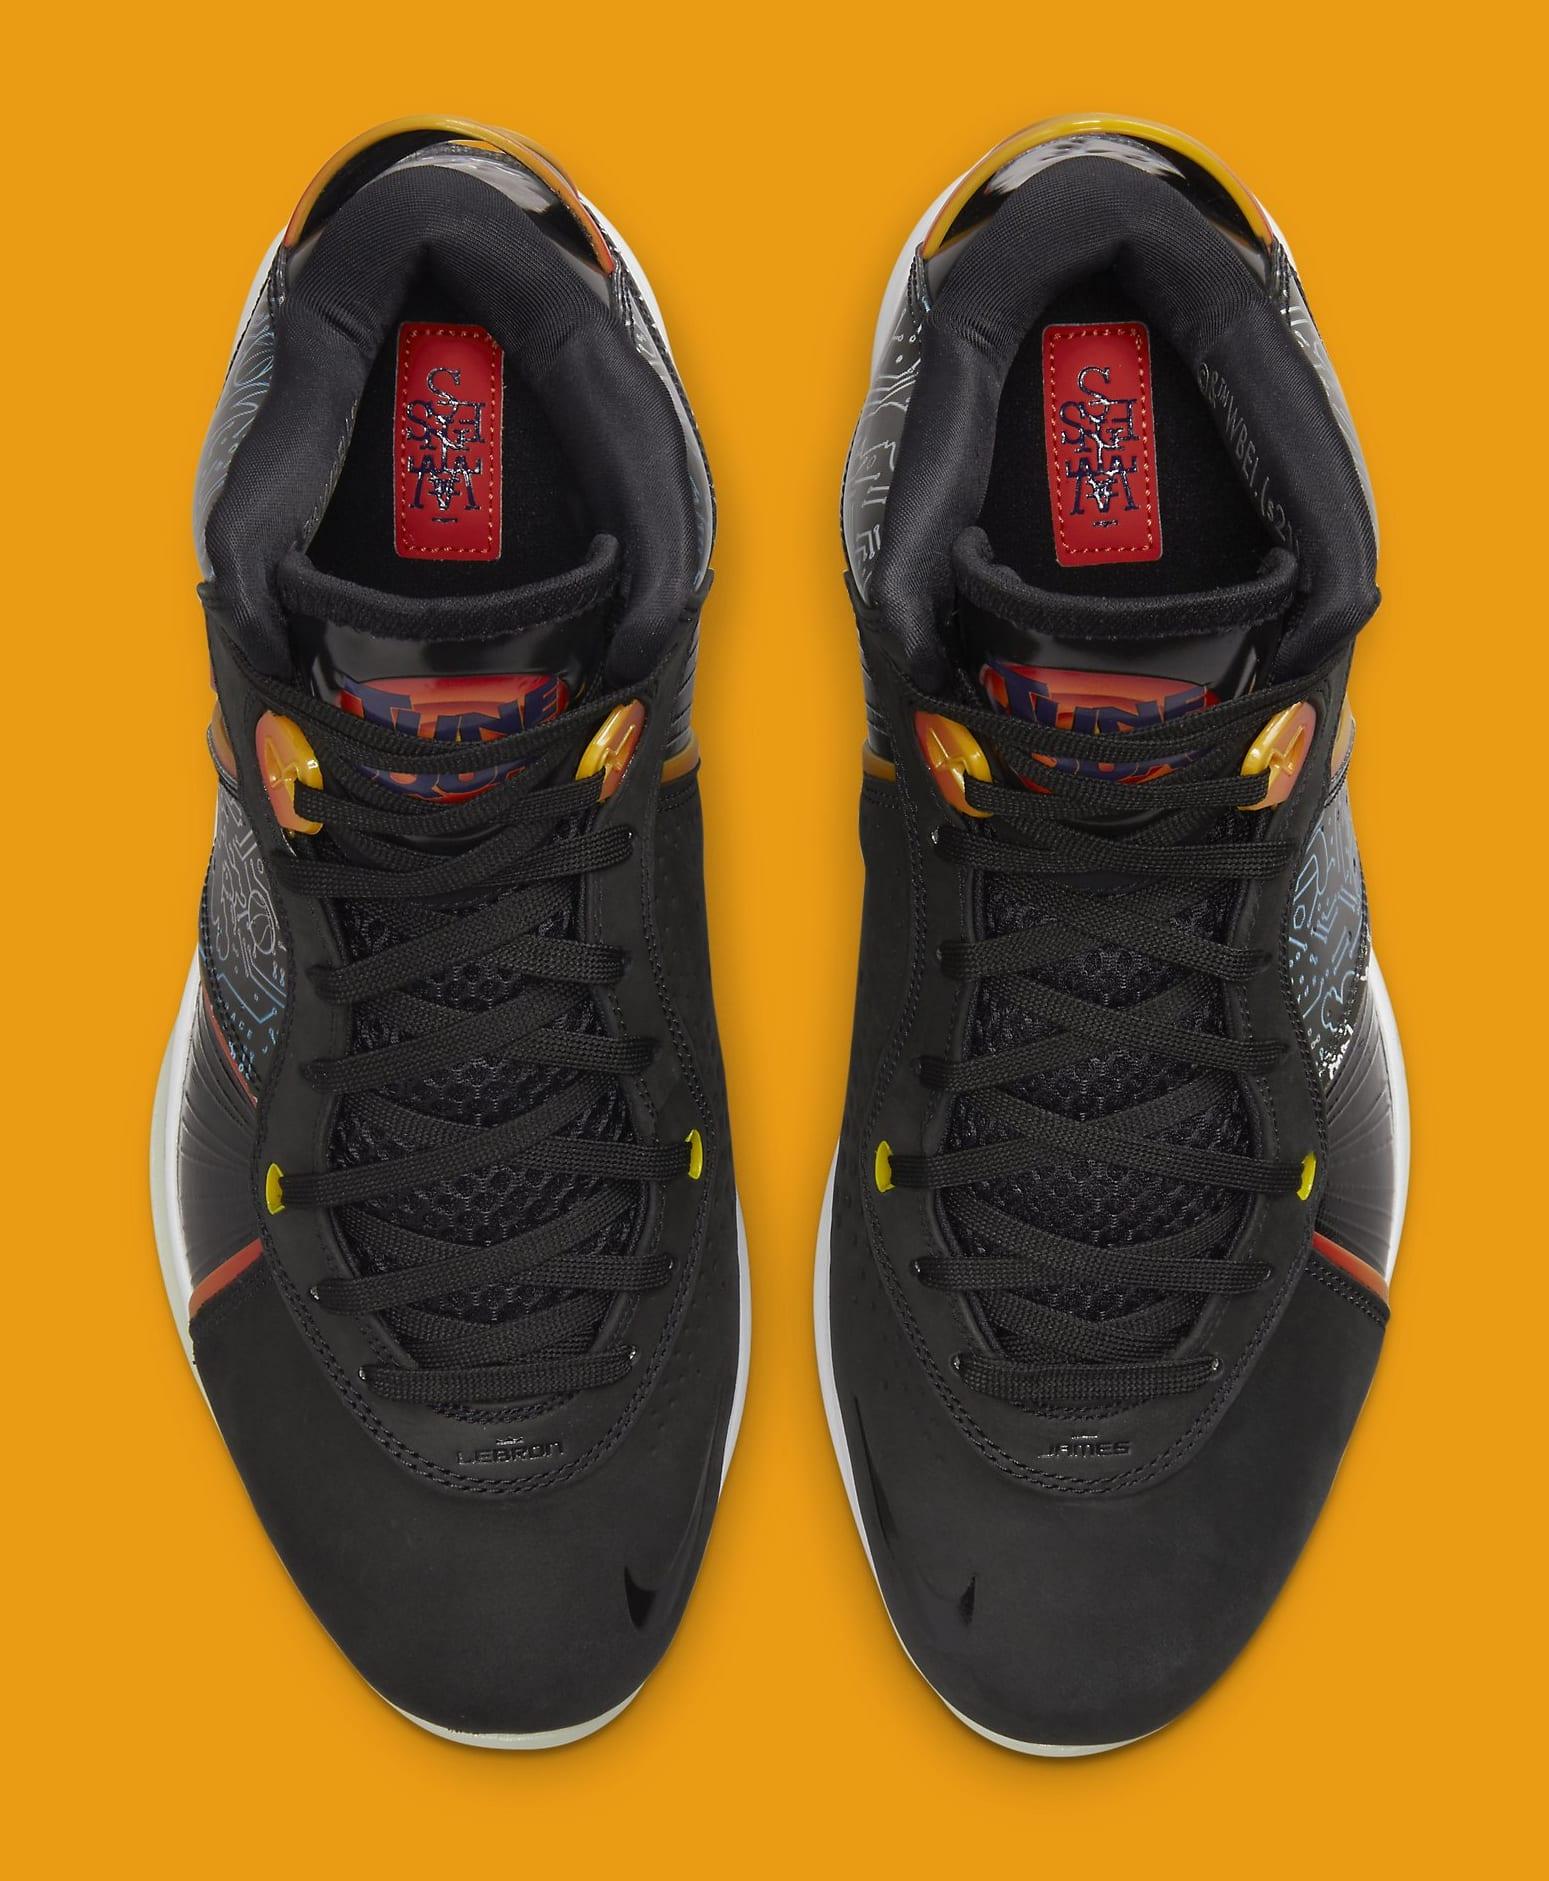 Nike LeBron 8 'Space Jam' DB1732-001 Top